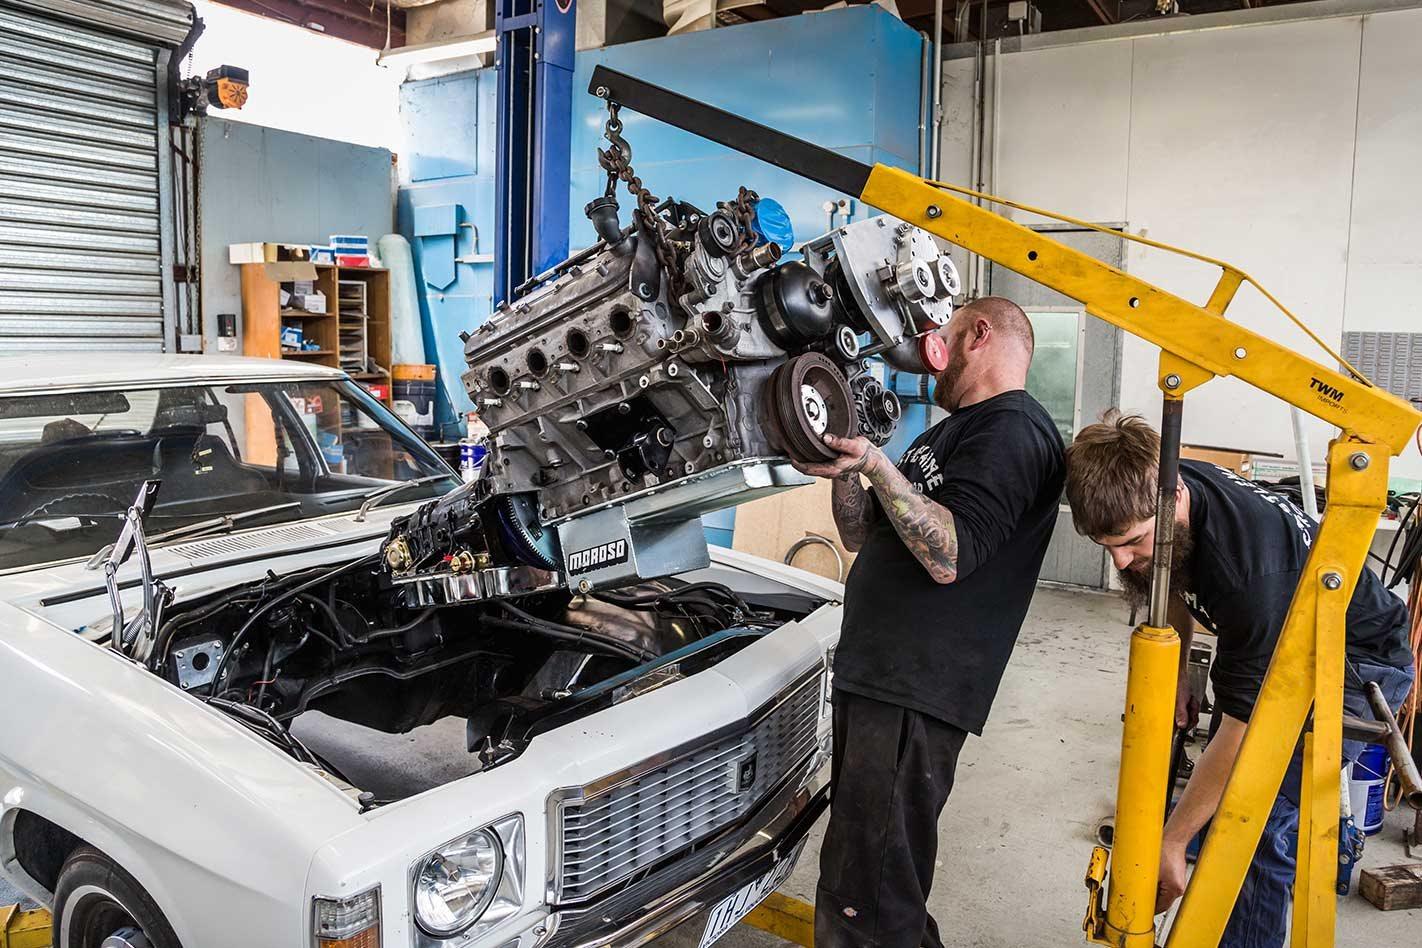 Castlemaine Rod Shop Holden Hj Kingswood Ls Conversion Ls1 Swap Wiring Harness